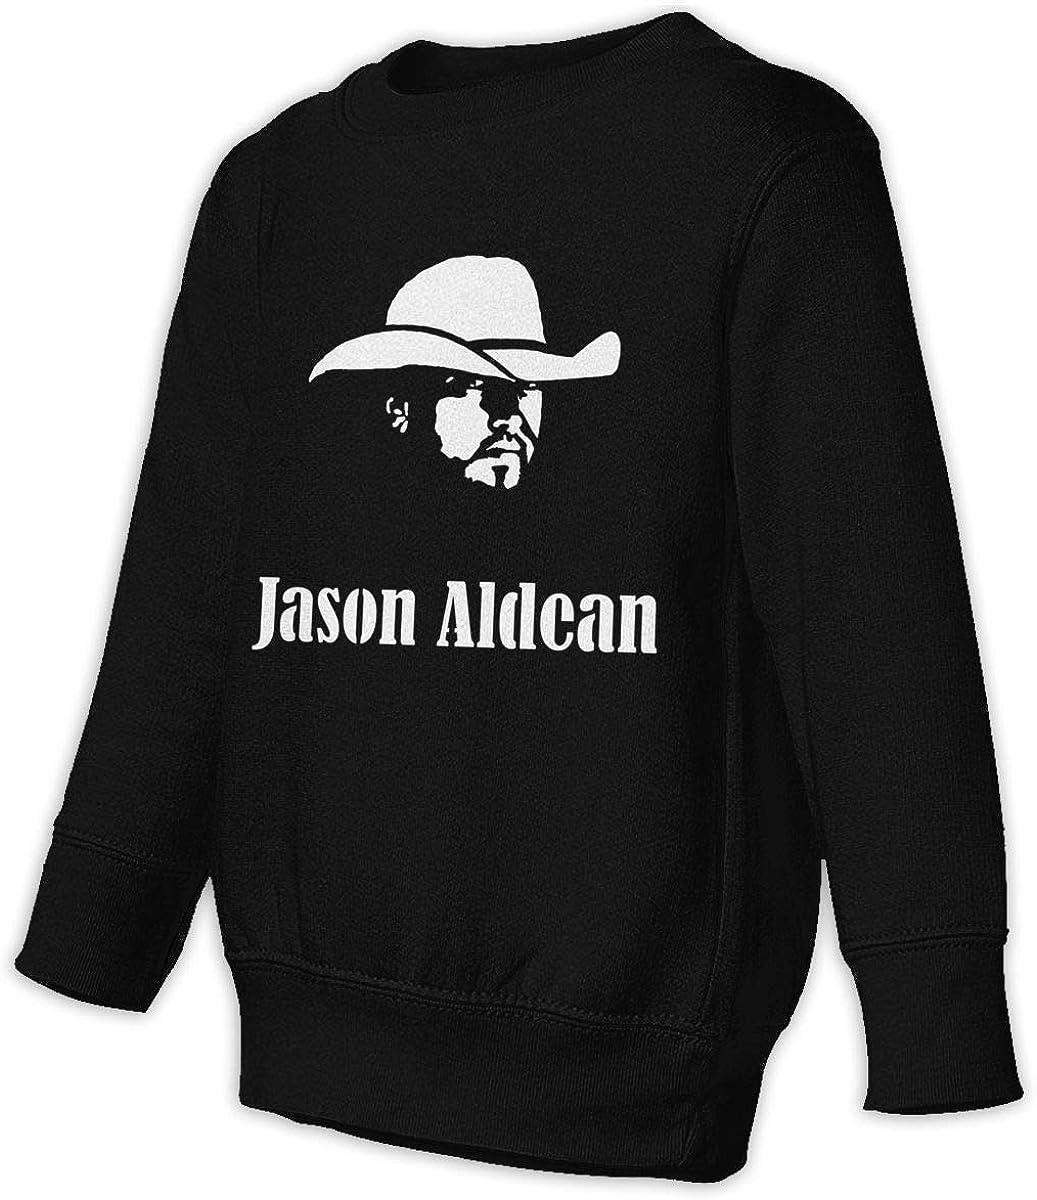 Cherry Anderson Ja-Son Al-Dean Toddler//Juvenile Crew Neck Sweatshirt Black